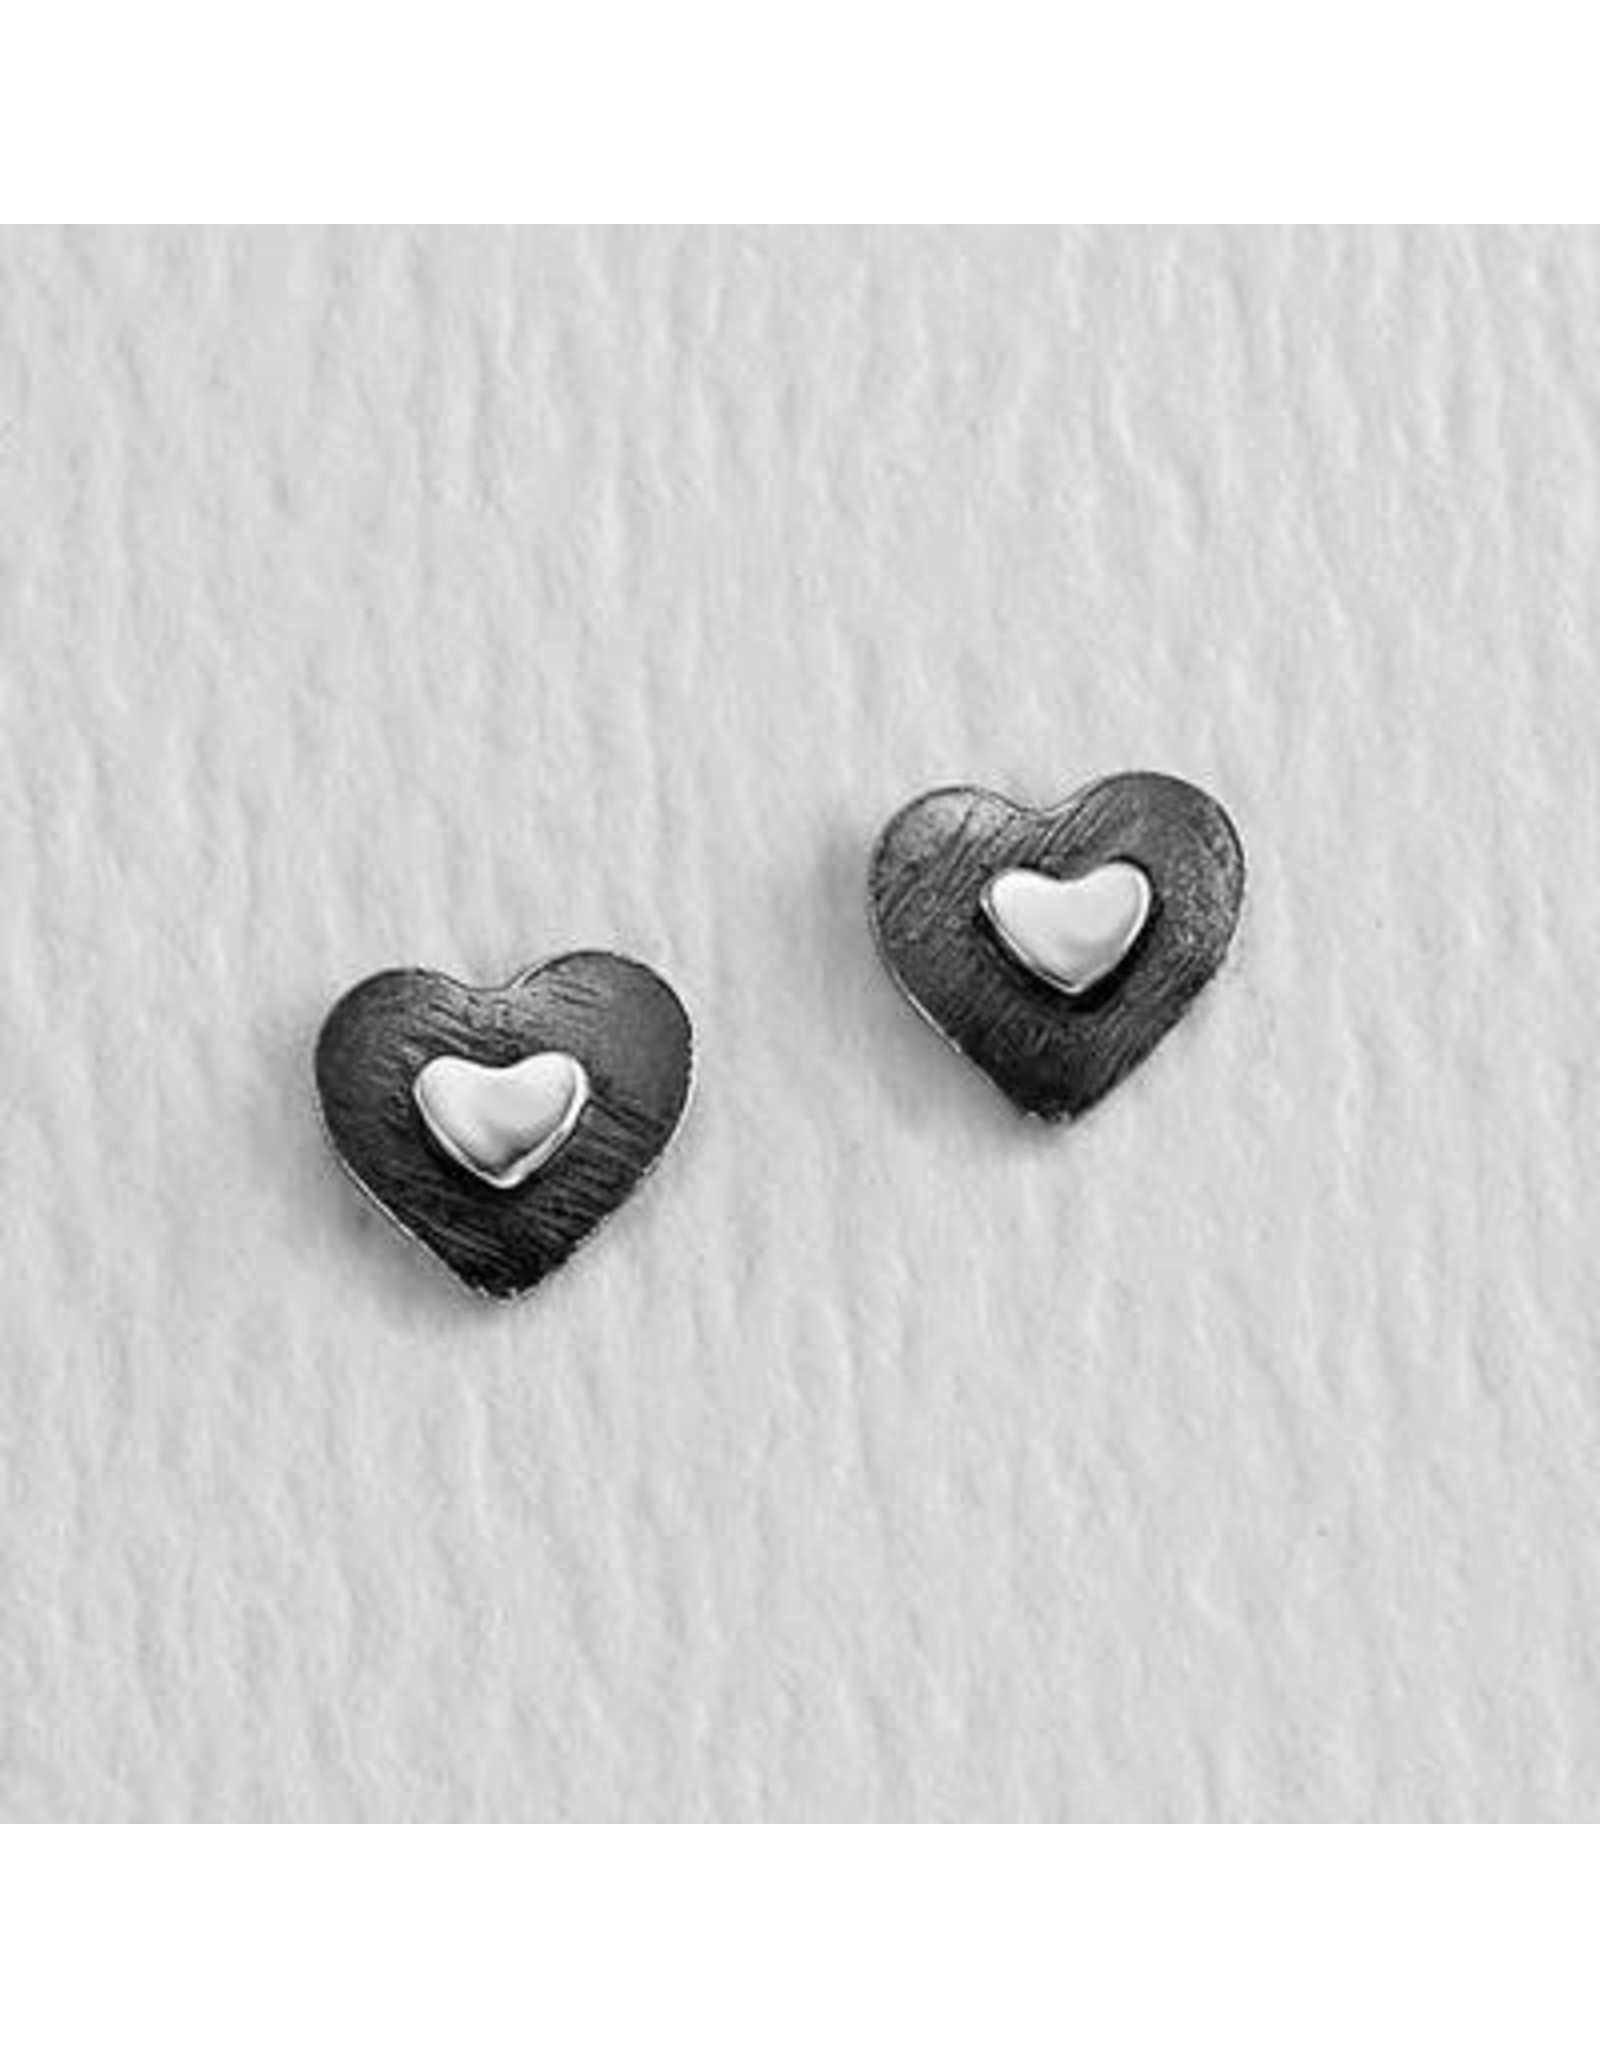 Double-Heart Sterling Silver Earrings, Mexico